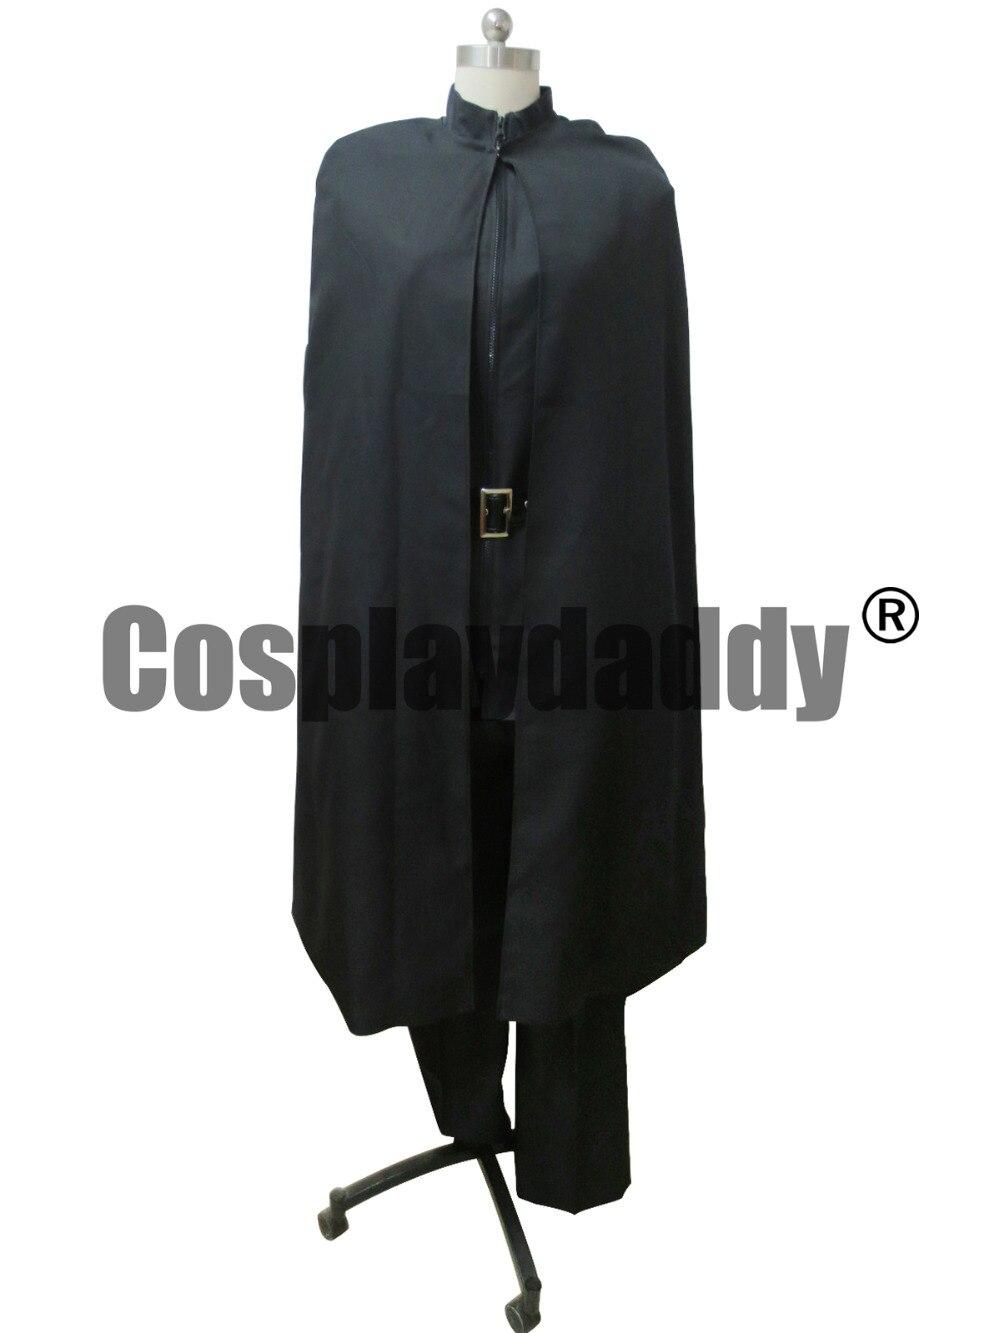 V For Vendetta Resin Mask Guy Fawkes Anonymous Cosplay Halloween Extri Jam Tangan Pria X3001a Hitam Tenun Kostum Dan Cape